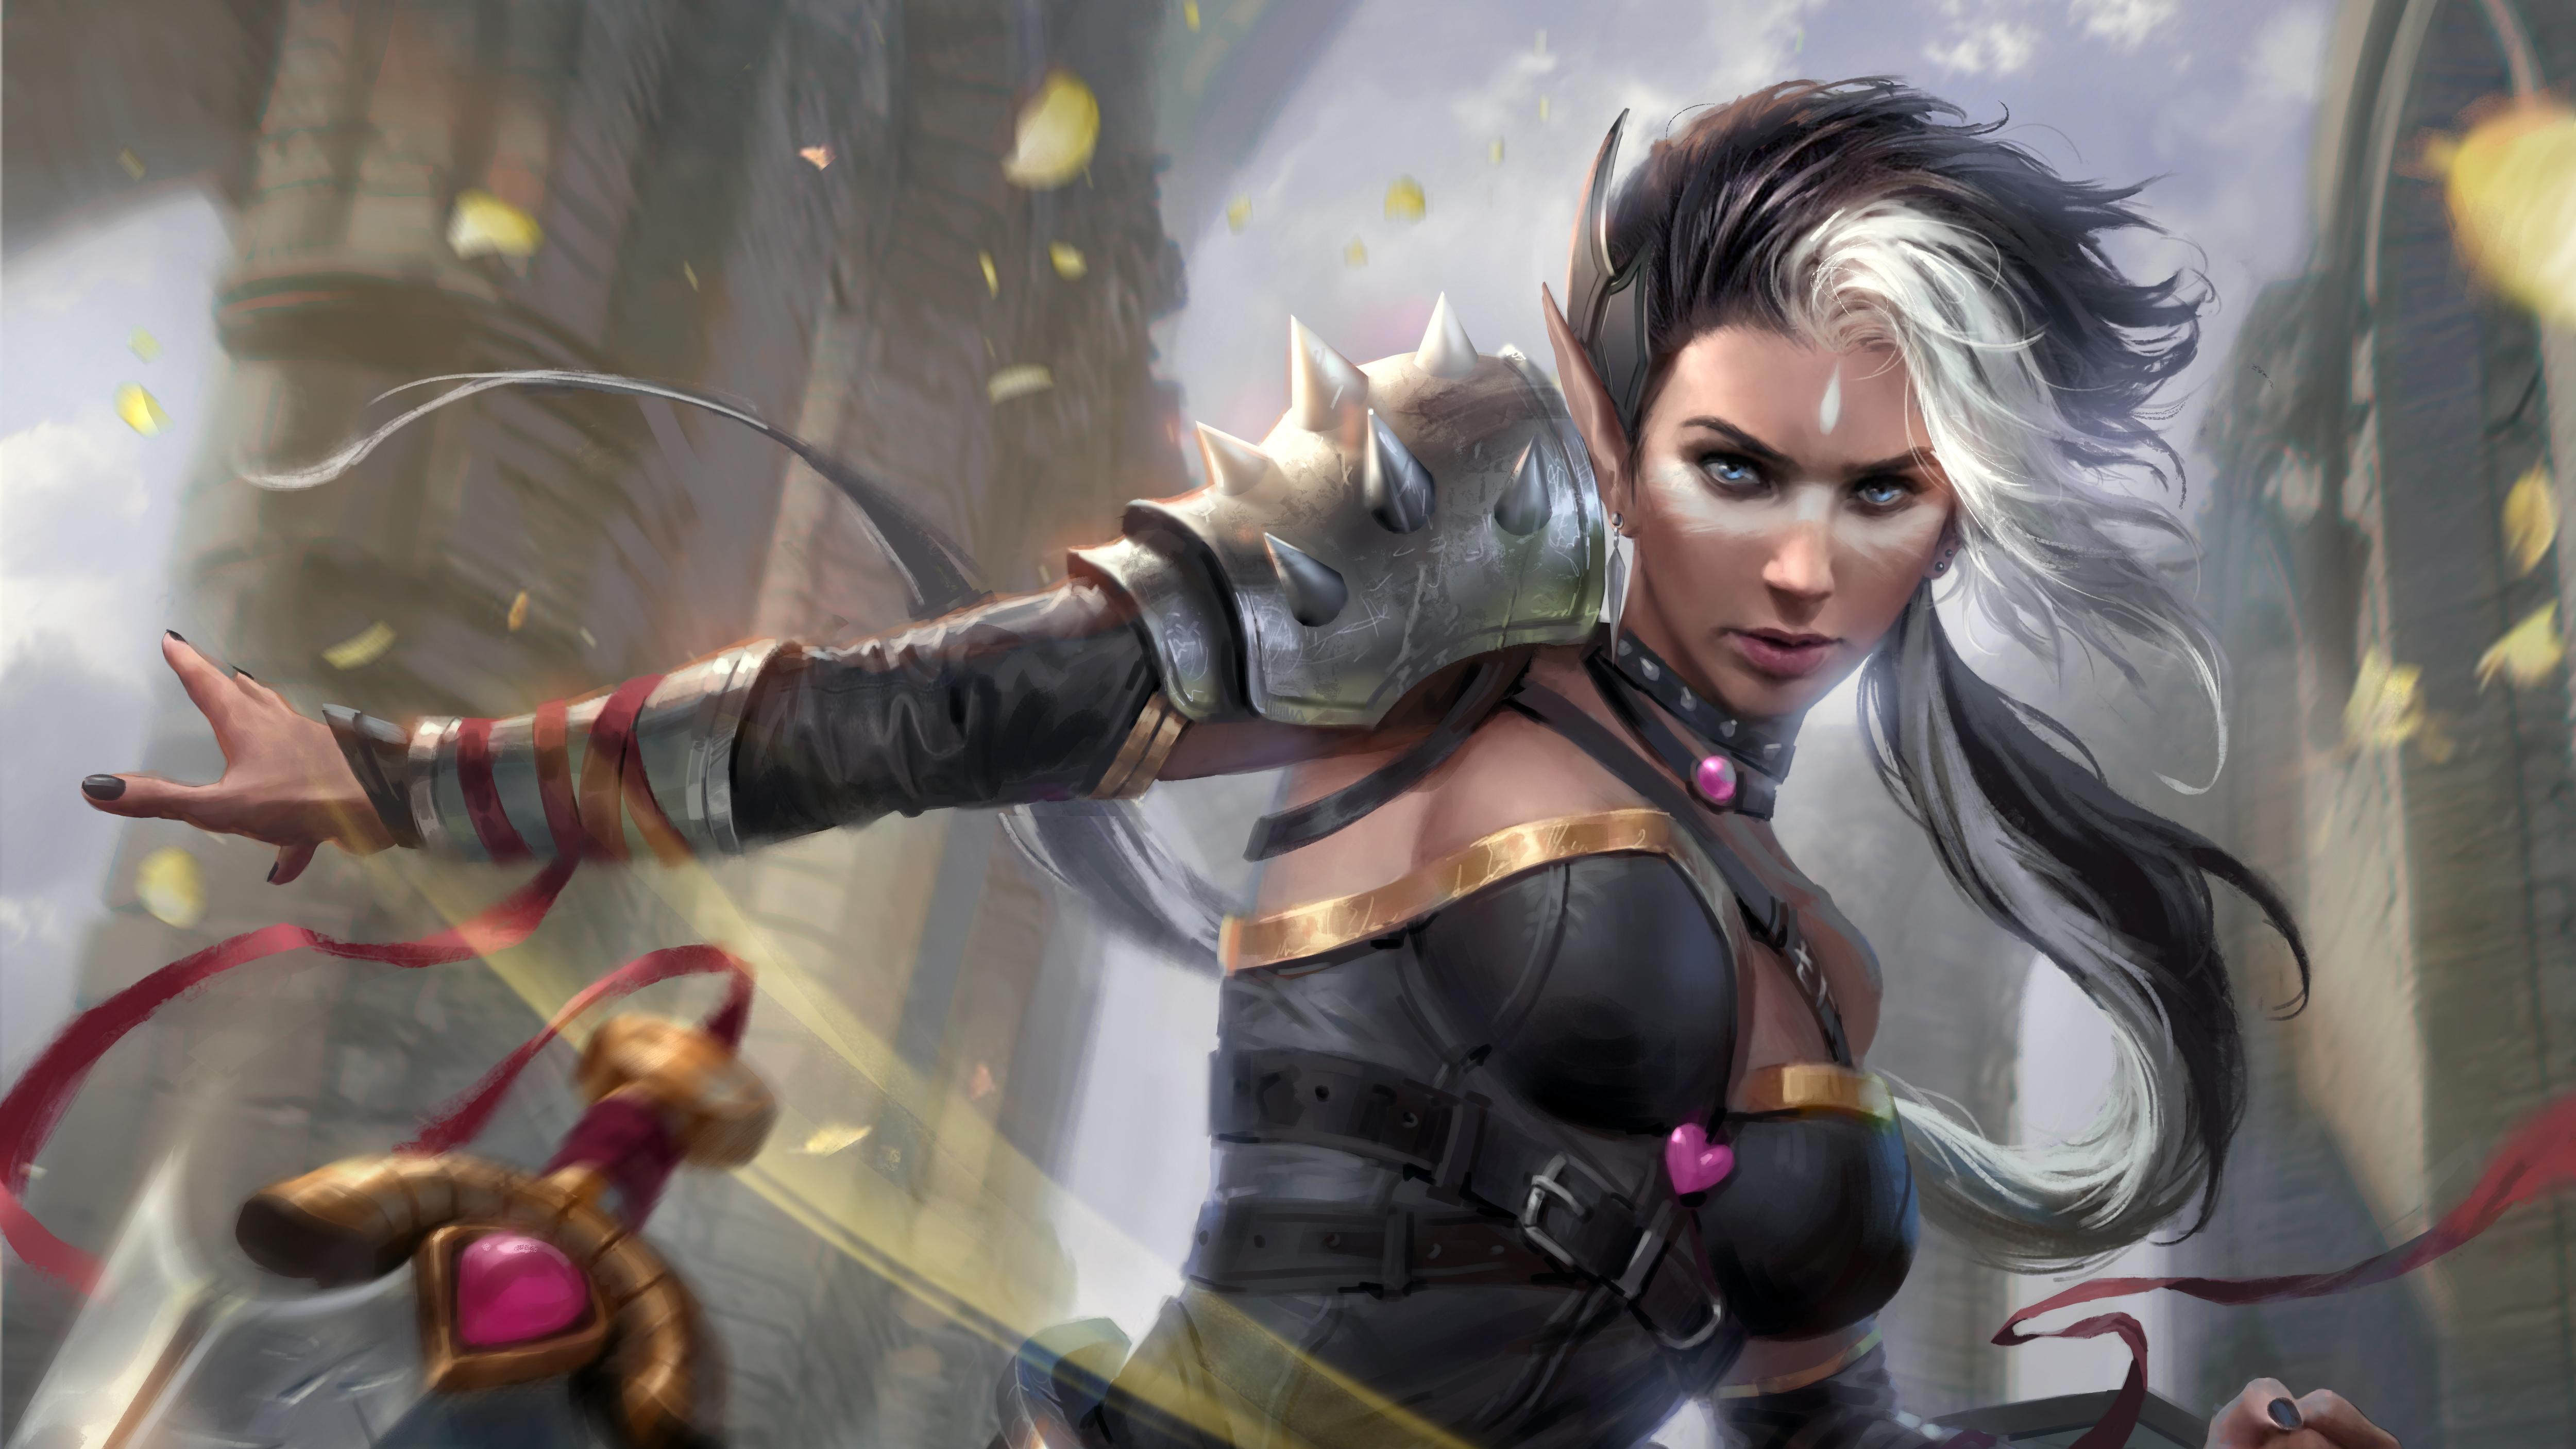 2560x1600 Redhead Fantasy Warrior Girl With Sword 4k 2560x1600 Resolution HD 4k Wallpapers